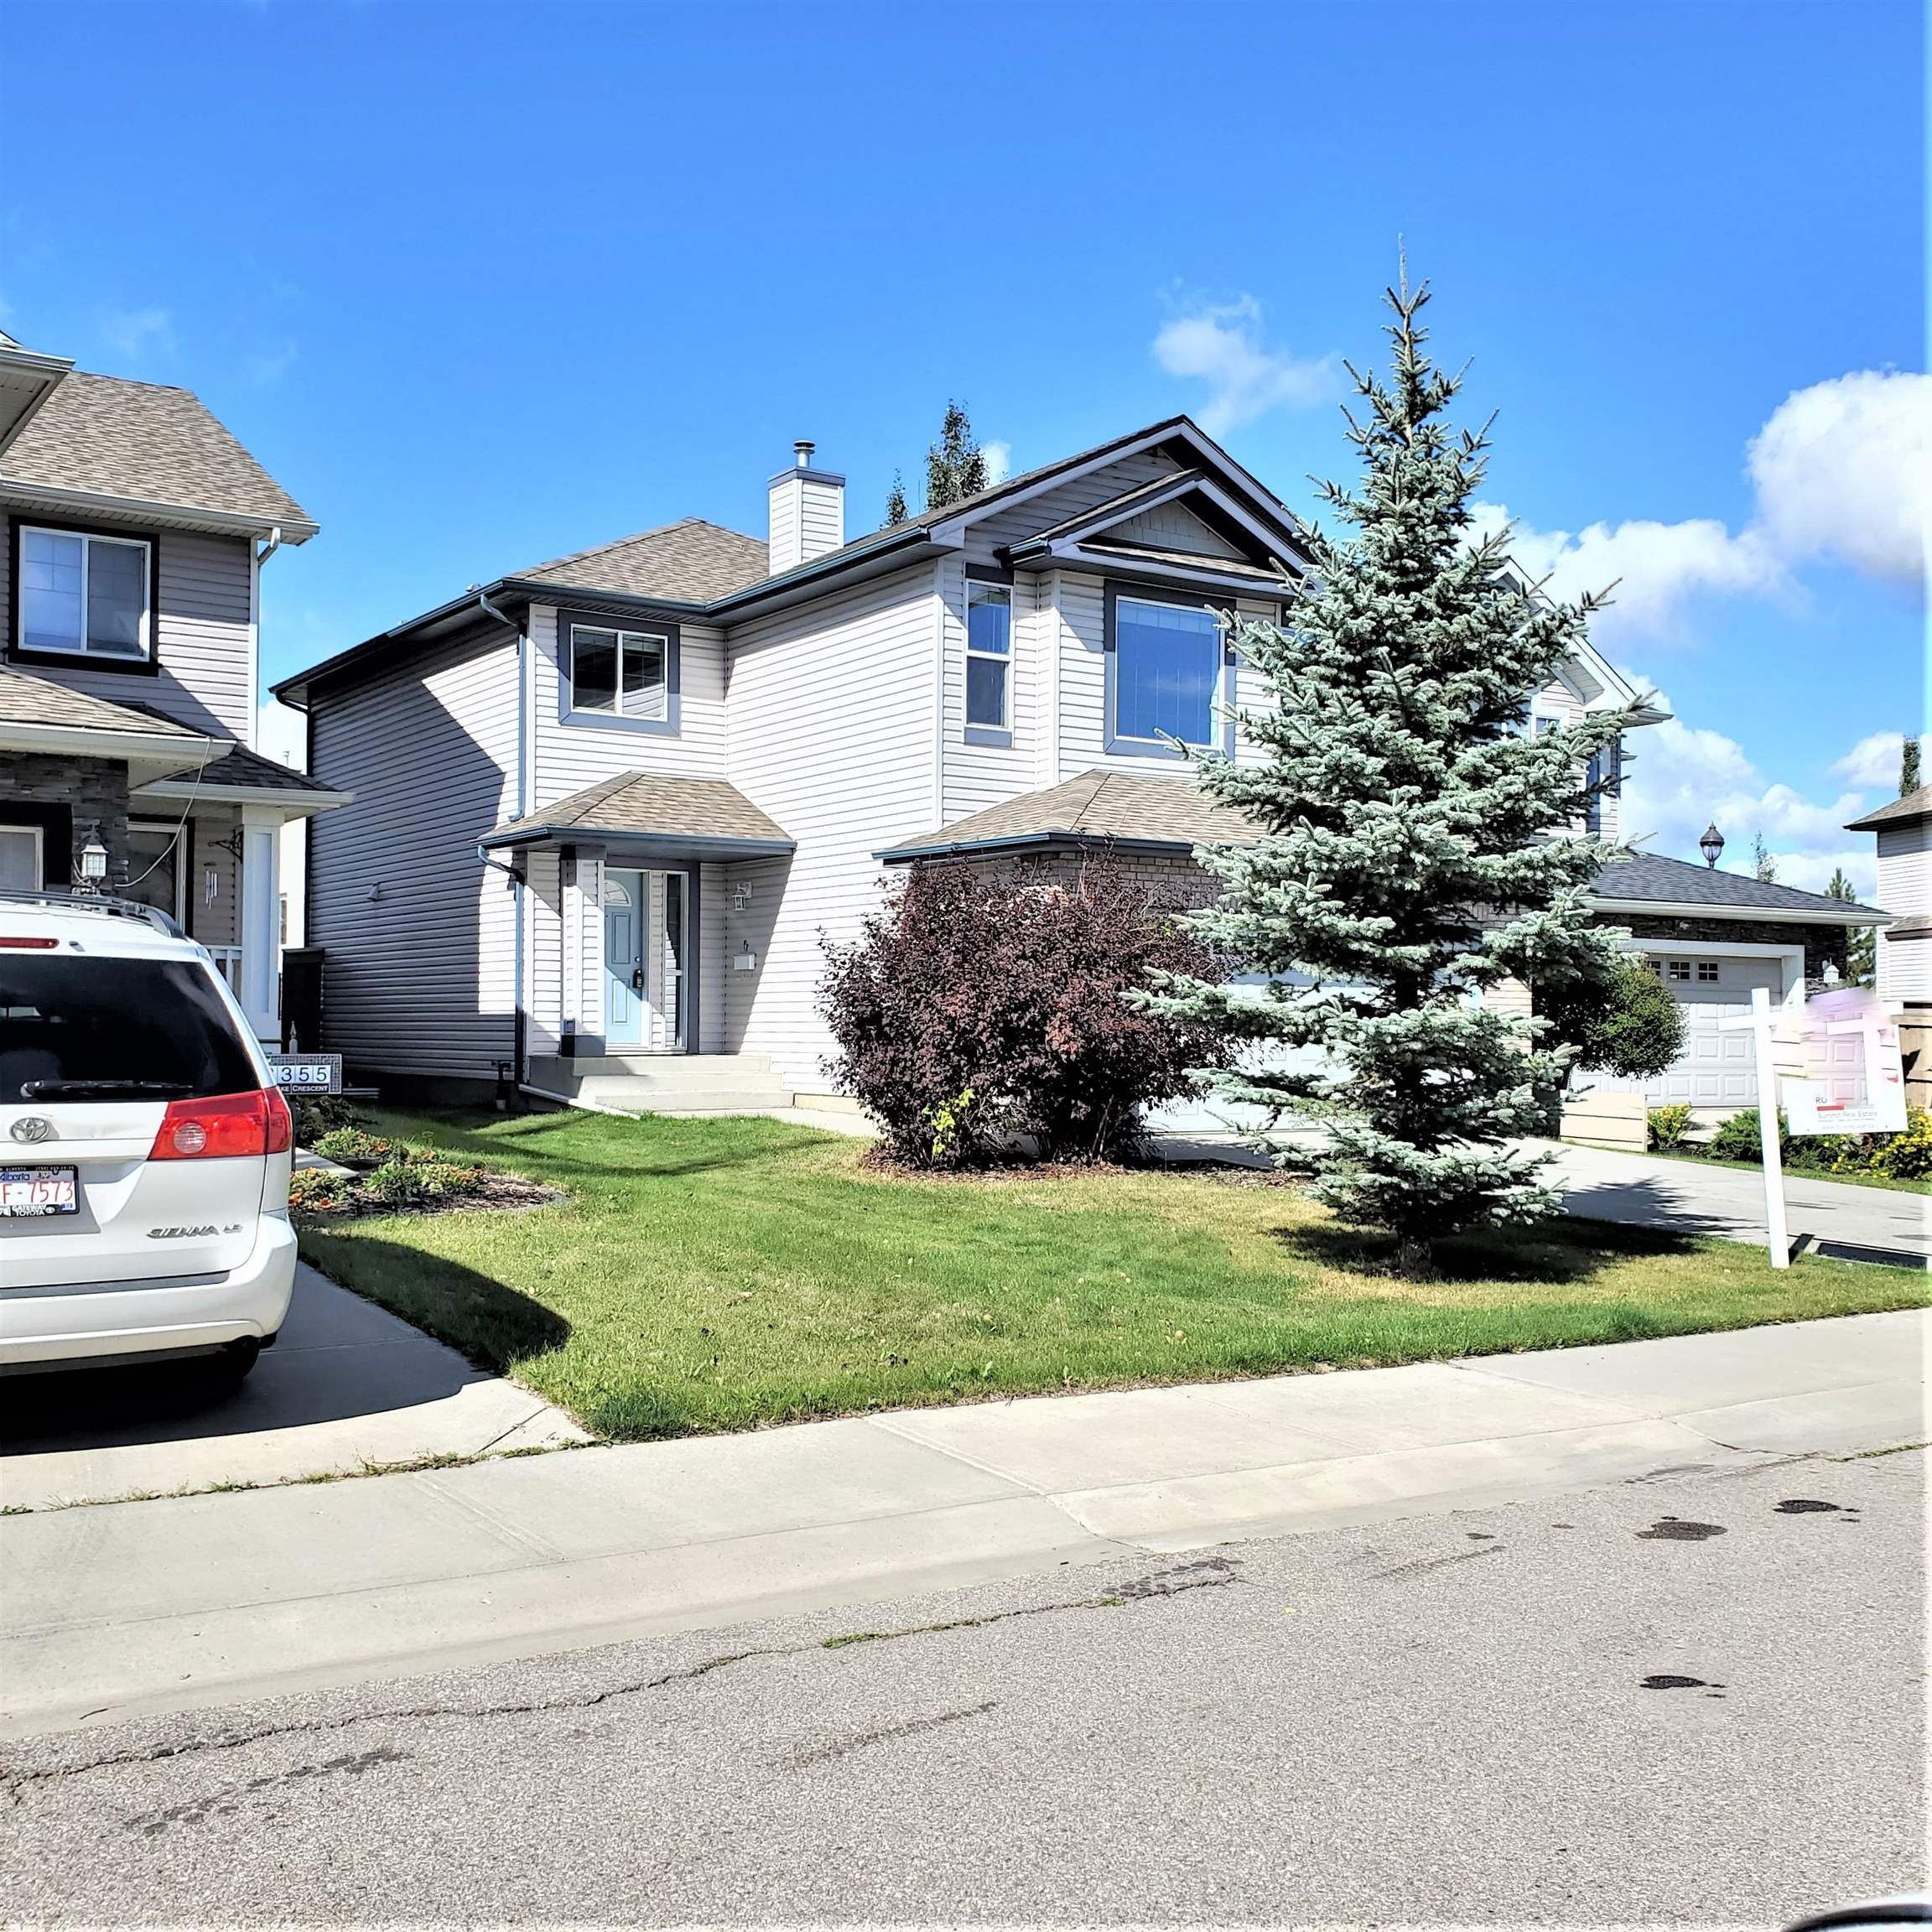 Main Photo: 8353 SHASKE Crescent in Edmonton: Zone 14 House for sale : MLS®# E4262275